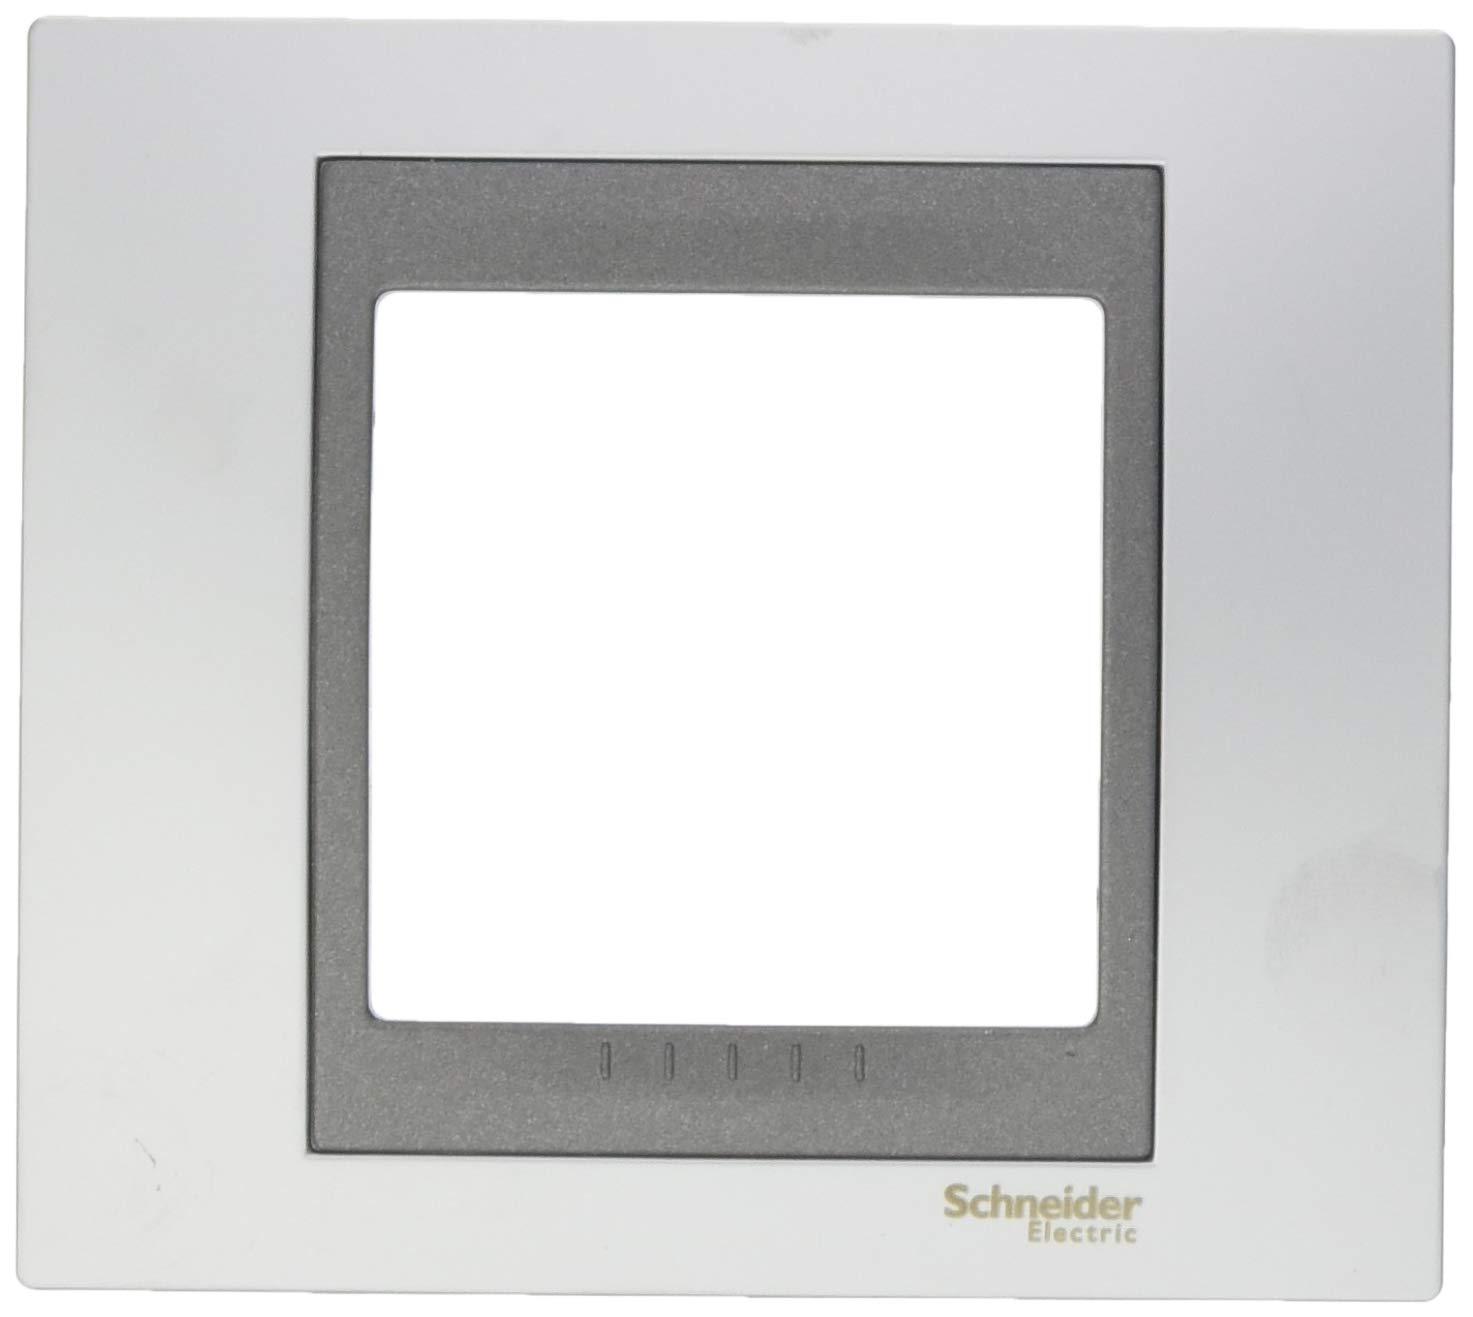 Schneider Electric MGU66.002.238B Marco Top 1 Elemento, color Cromo Satinado